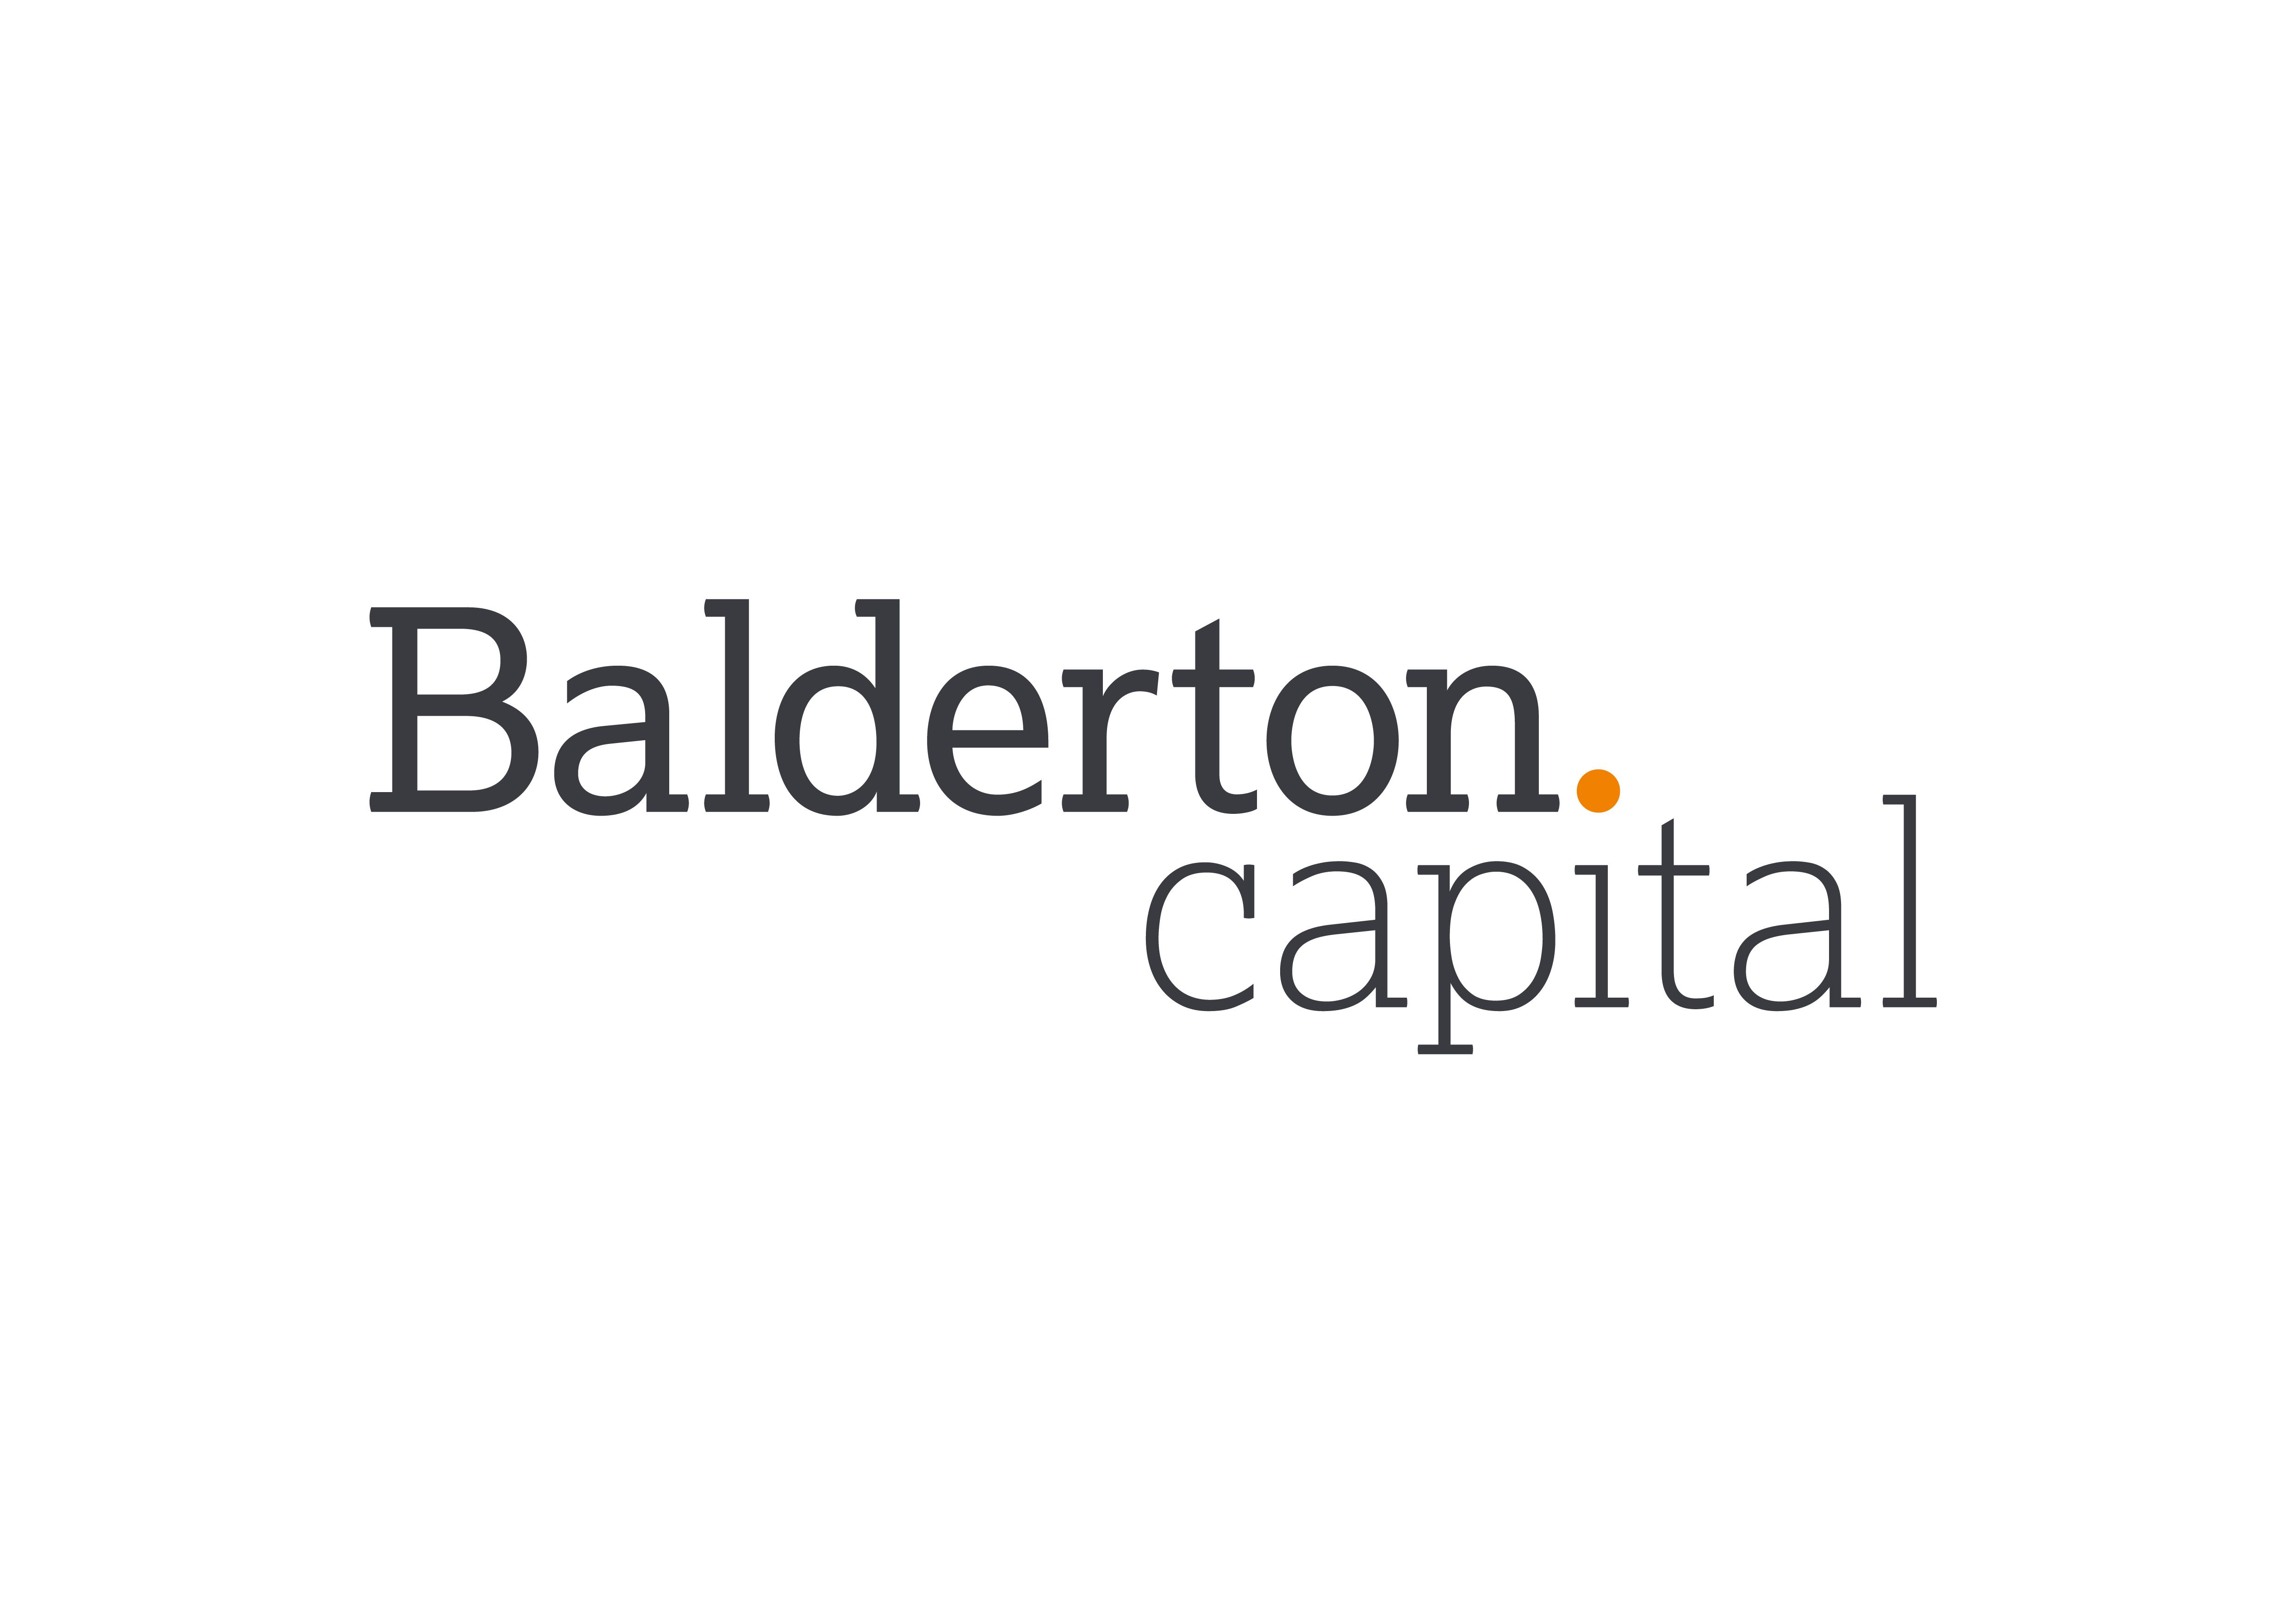 Balderton